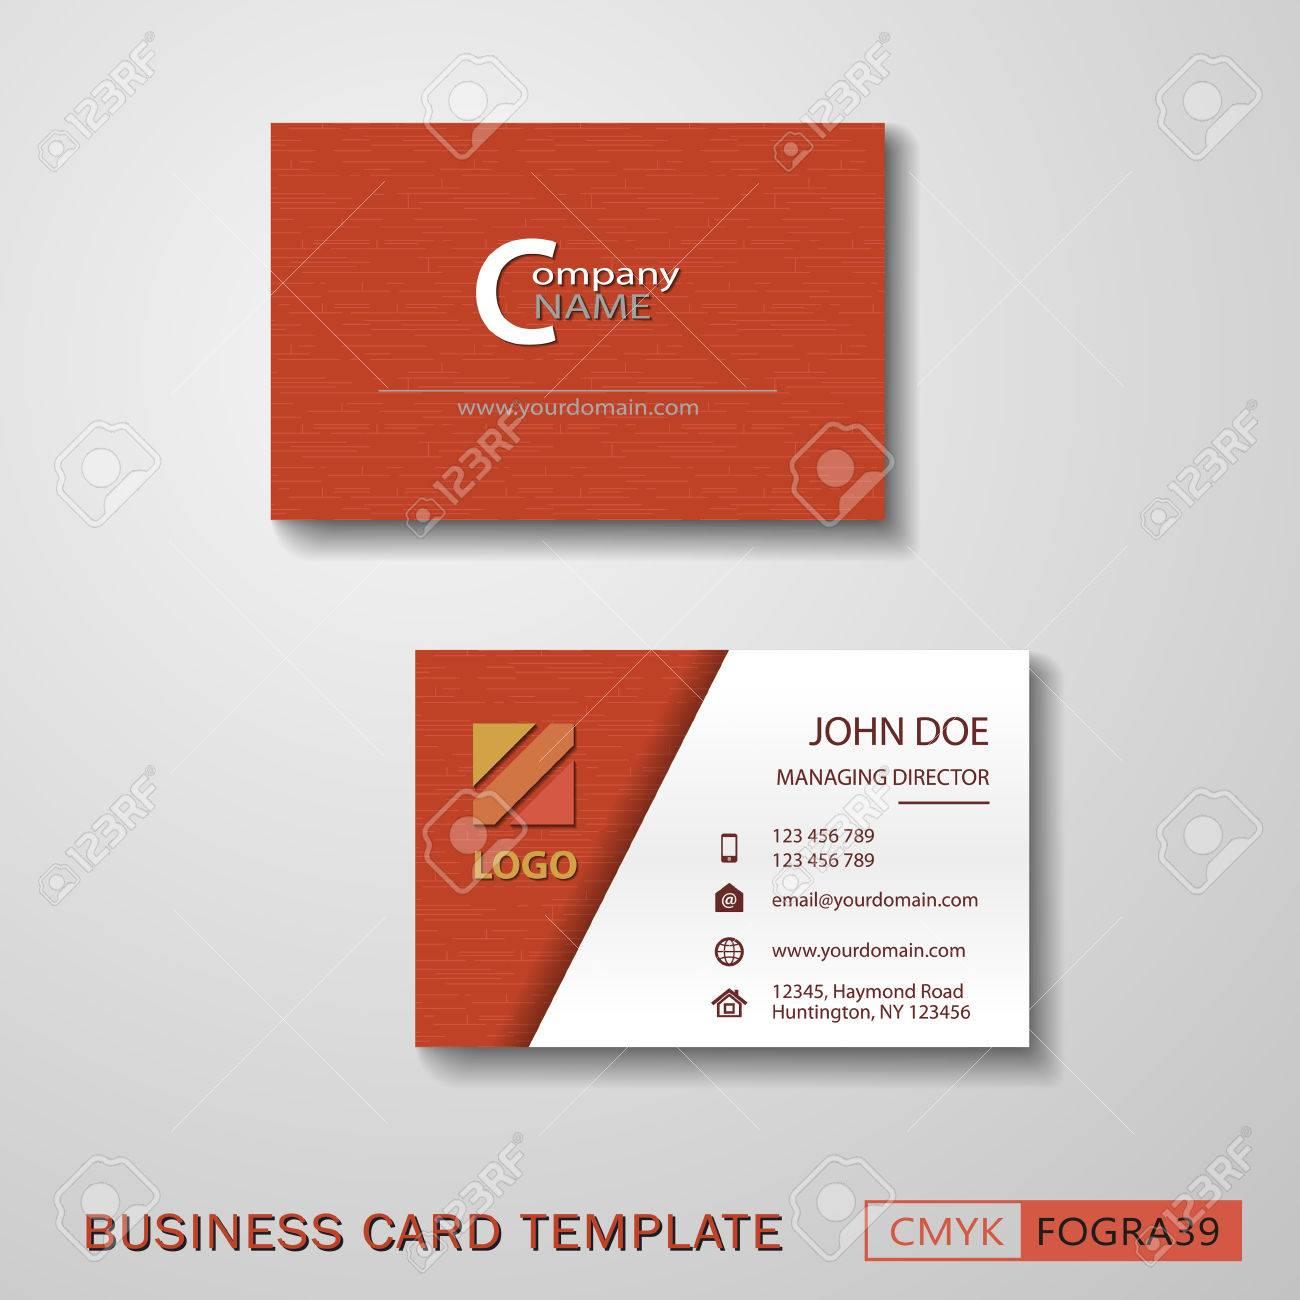 Vcard business card set red royalty free cliparts vectors and vcard business card set red stock vector 60951907 colourmoves